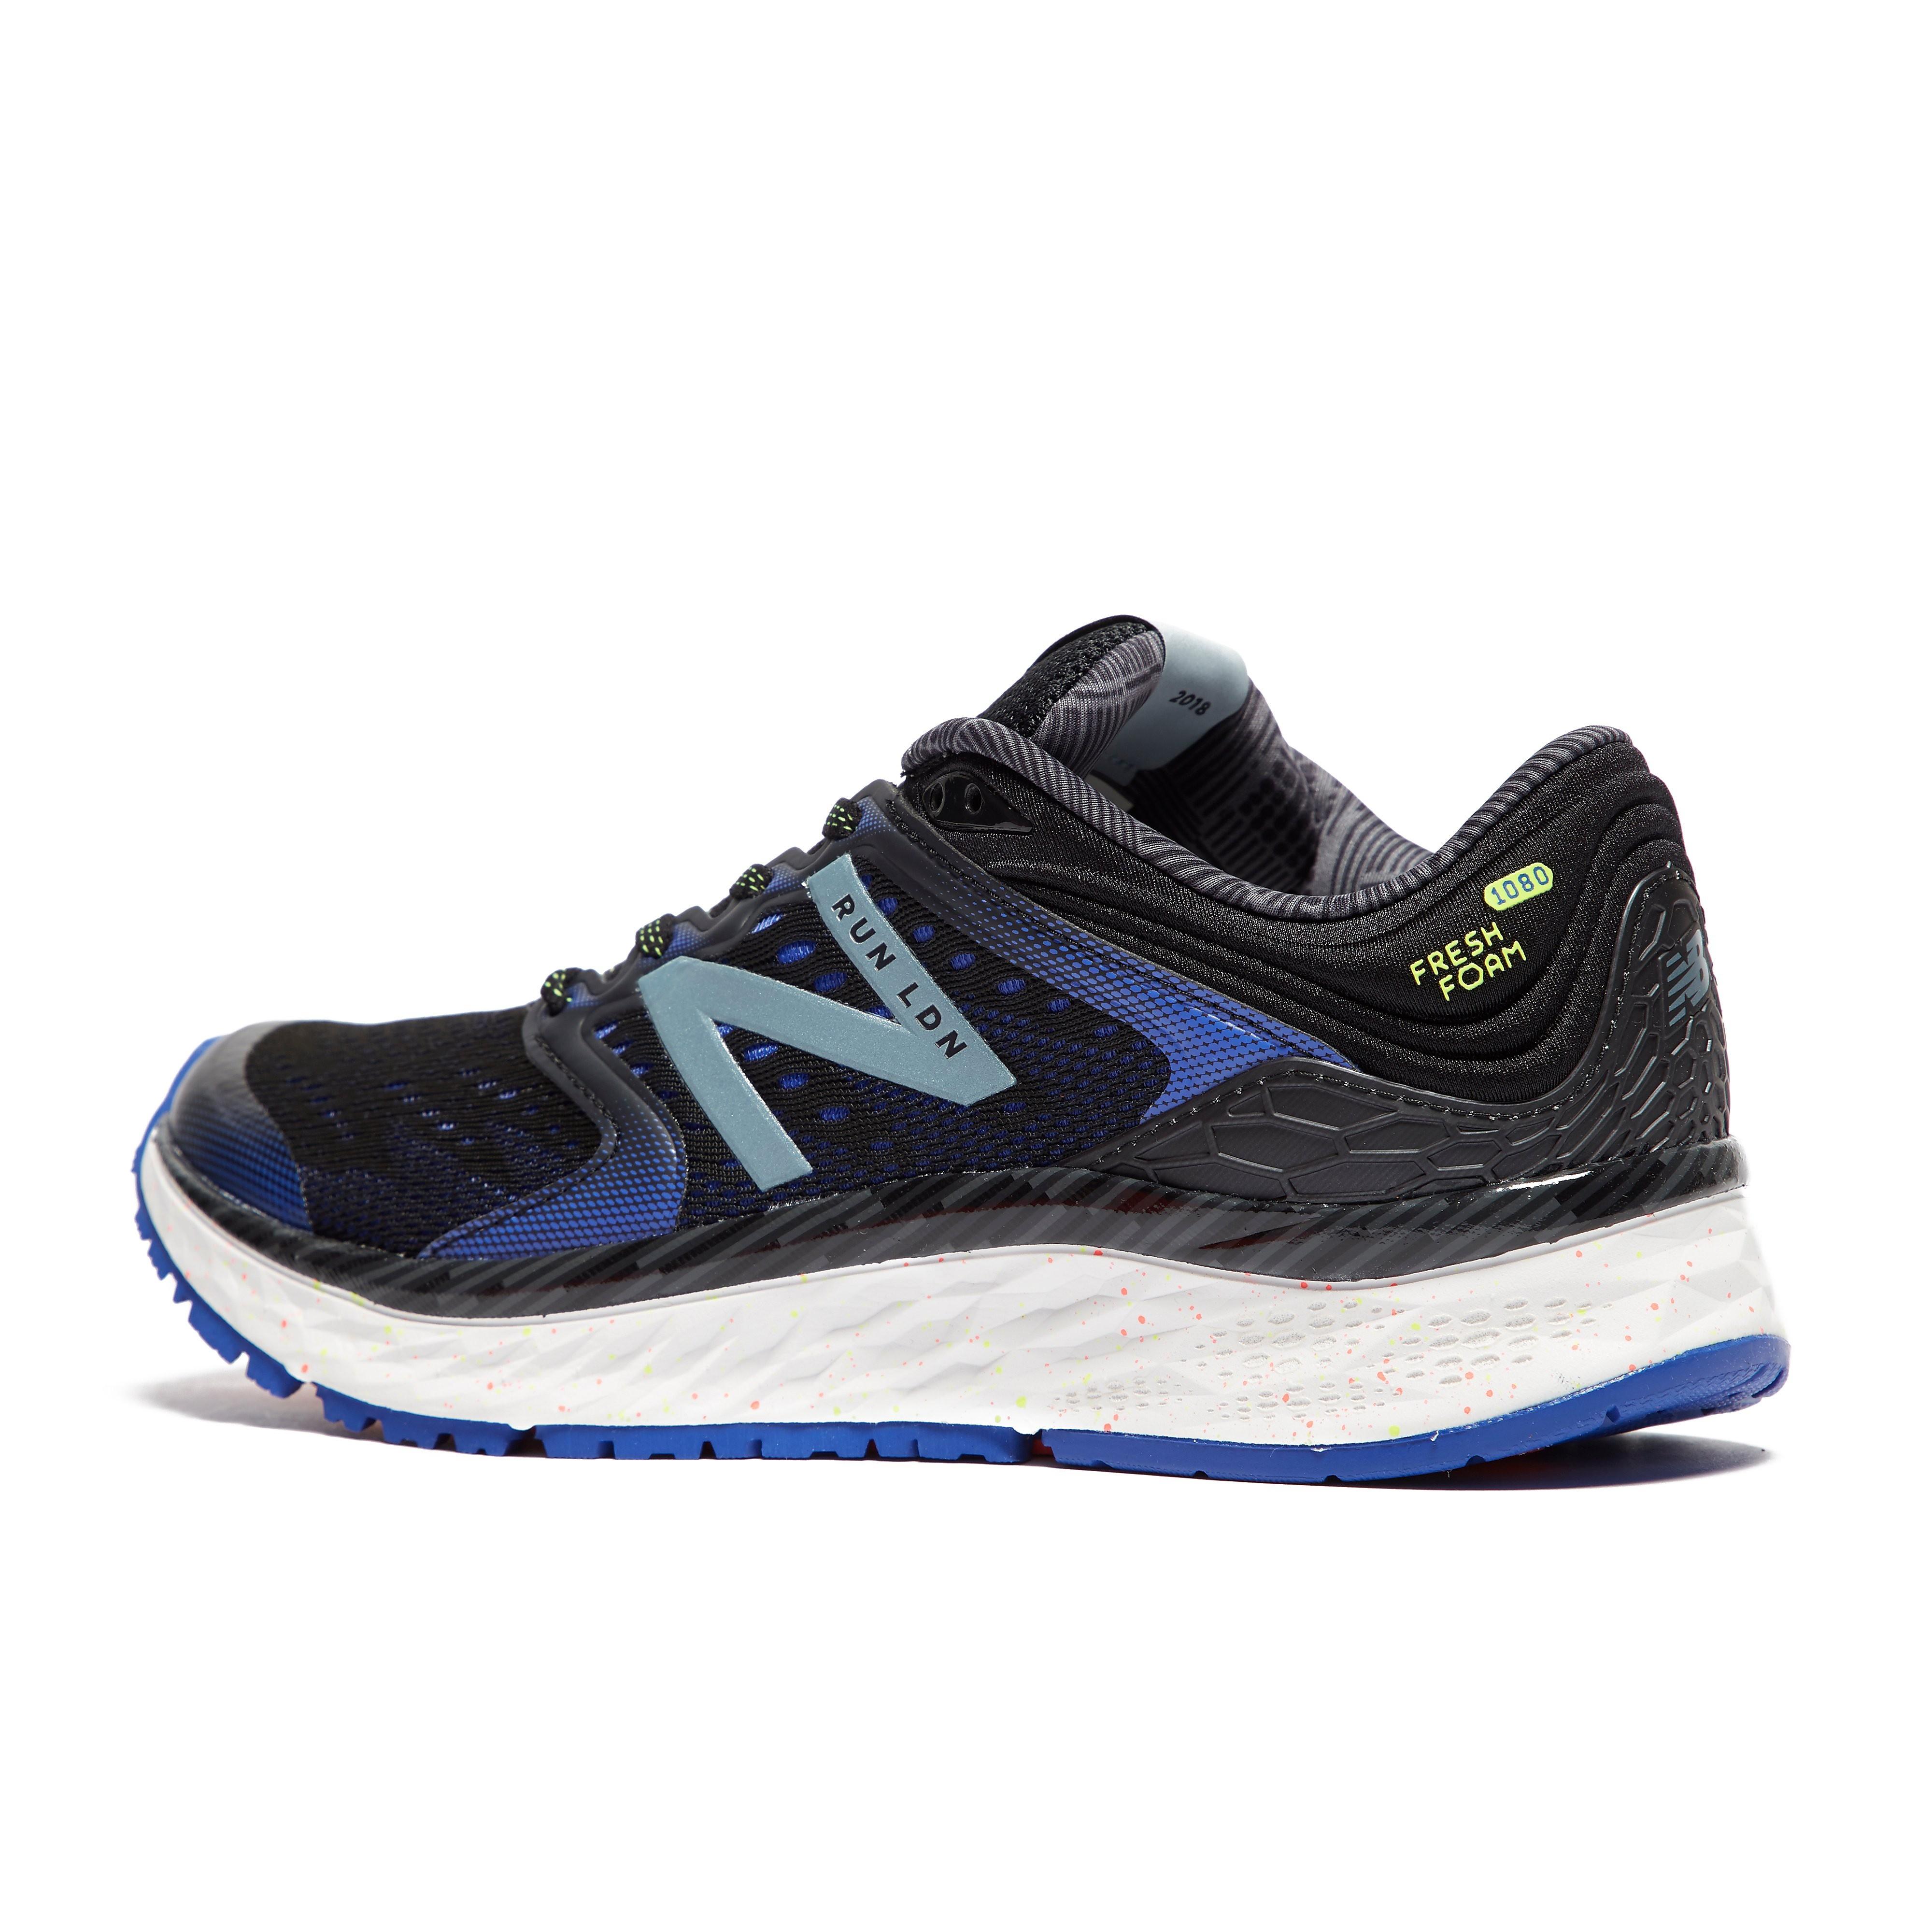 New Balance 1080v8 London Marathon Edition Women's Running Shoes